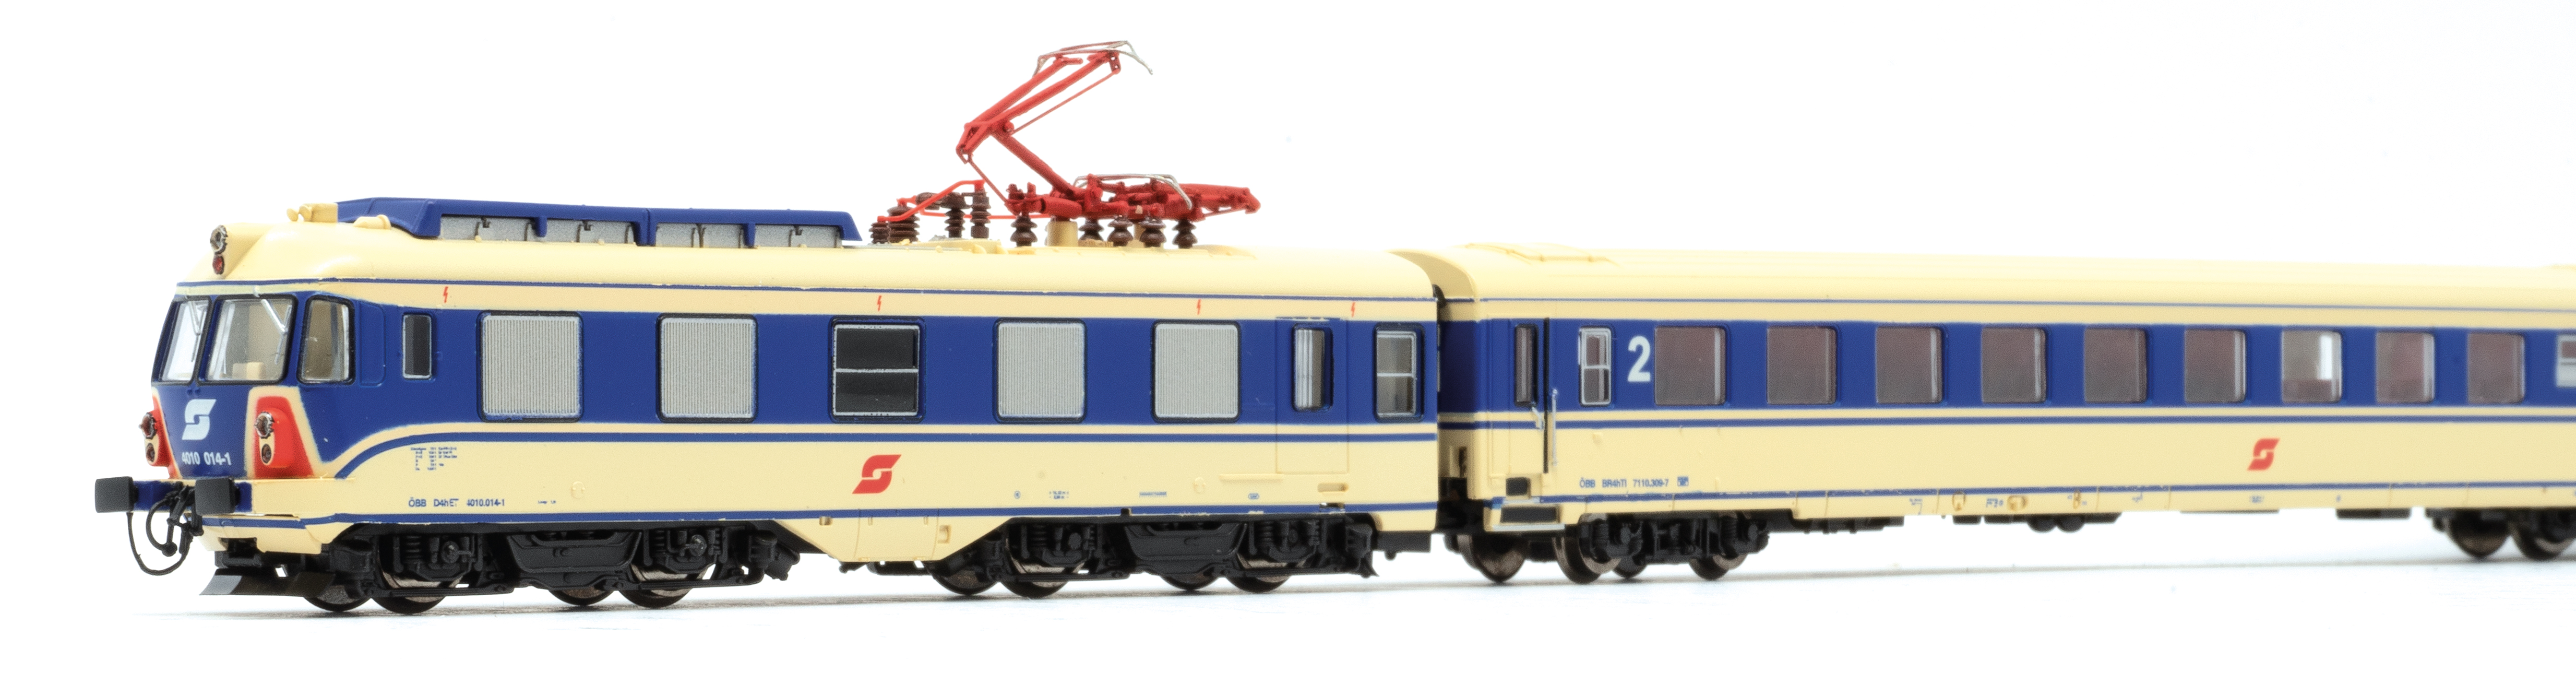 JC74312